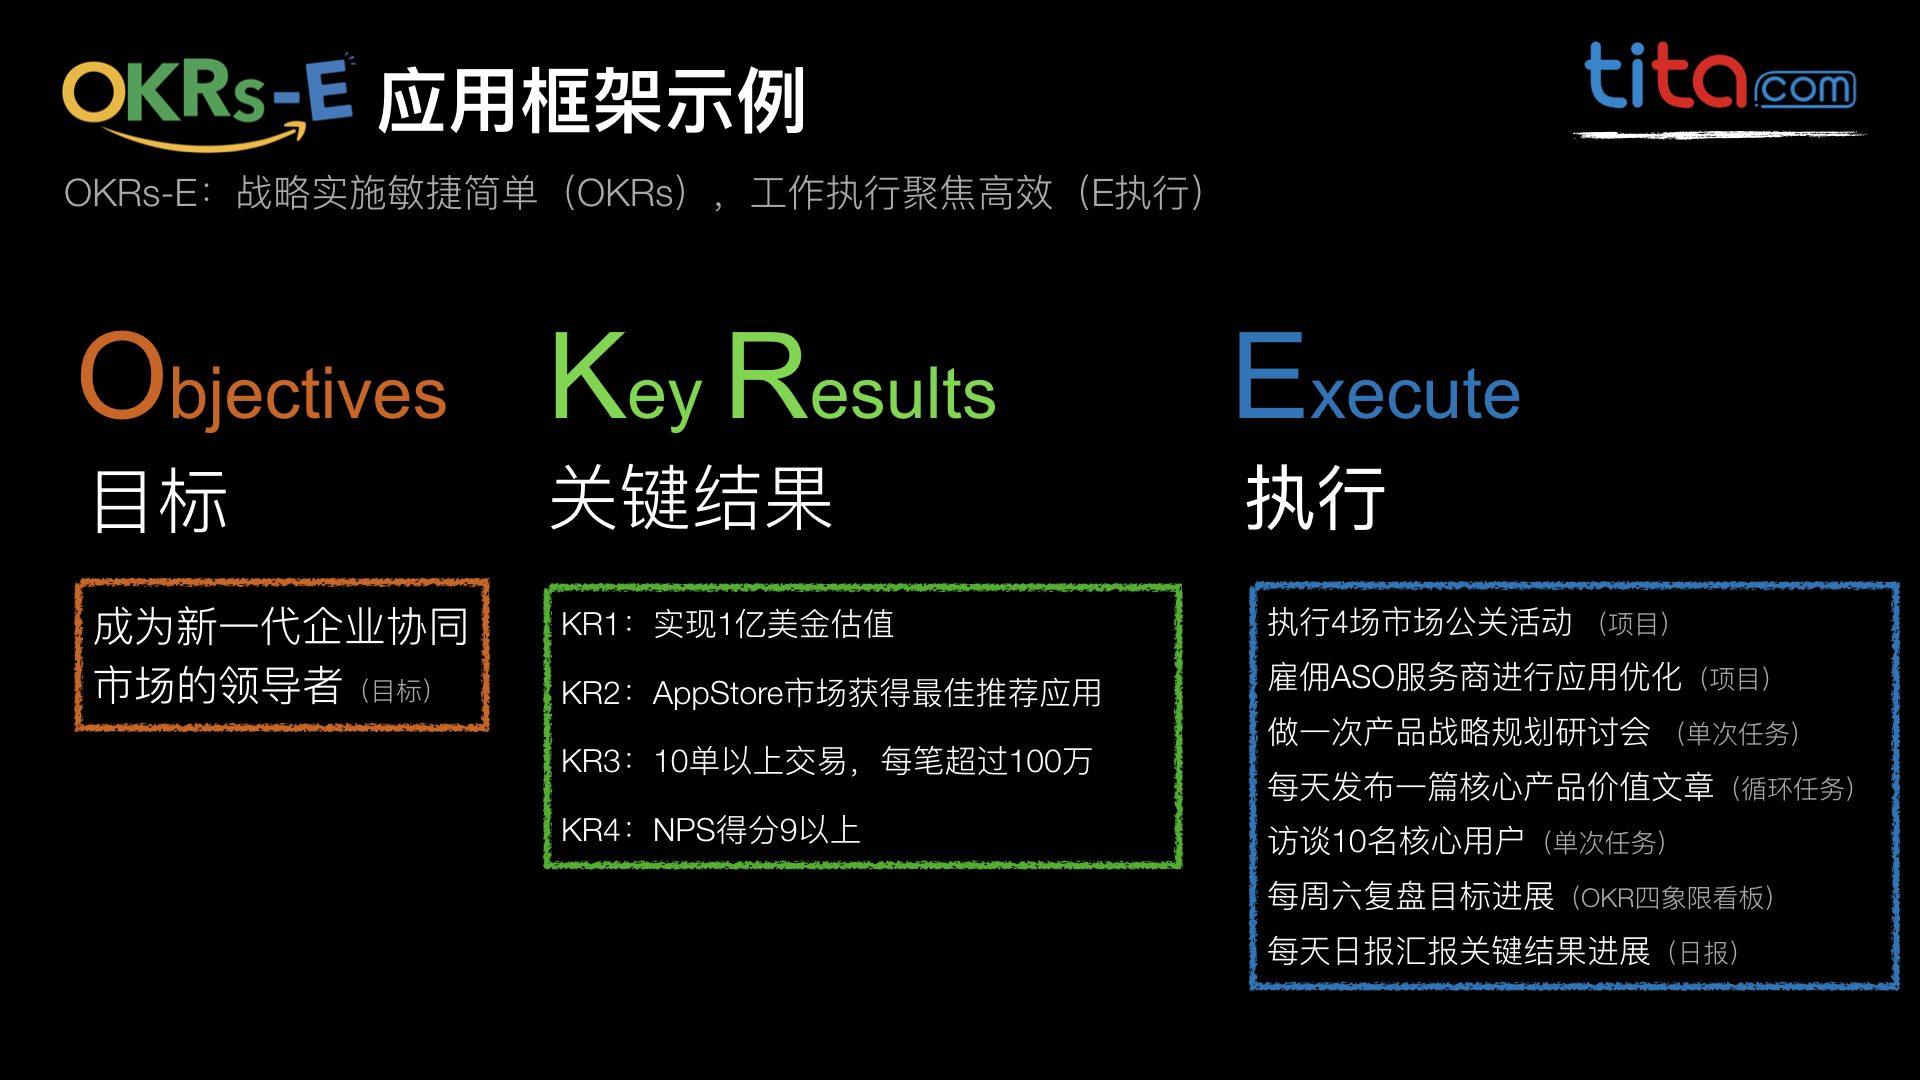 OKRs-E 目标管理和工作计划执行软件平台